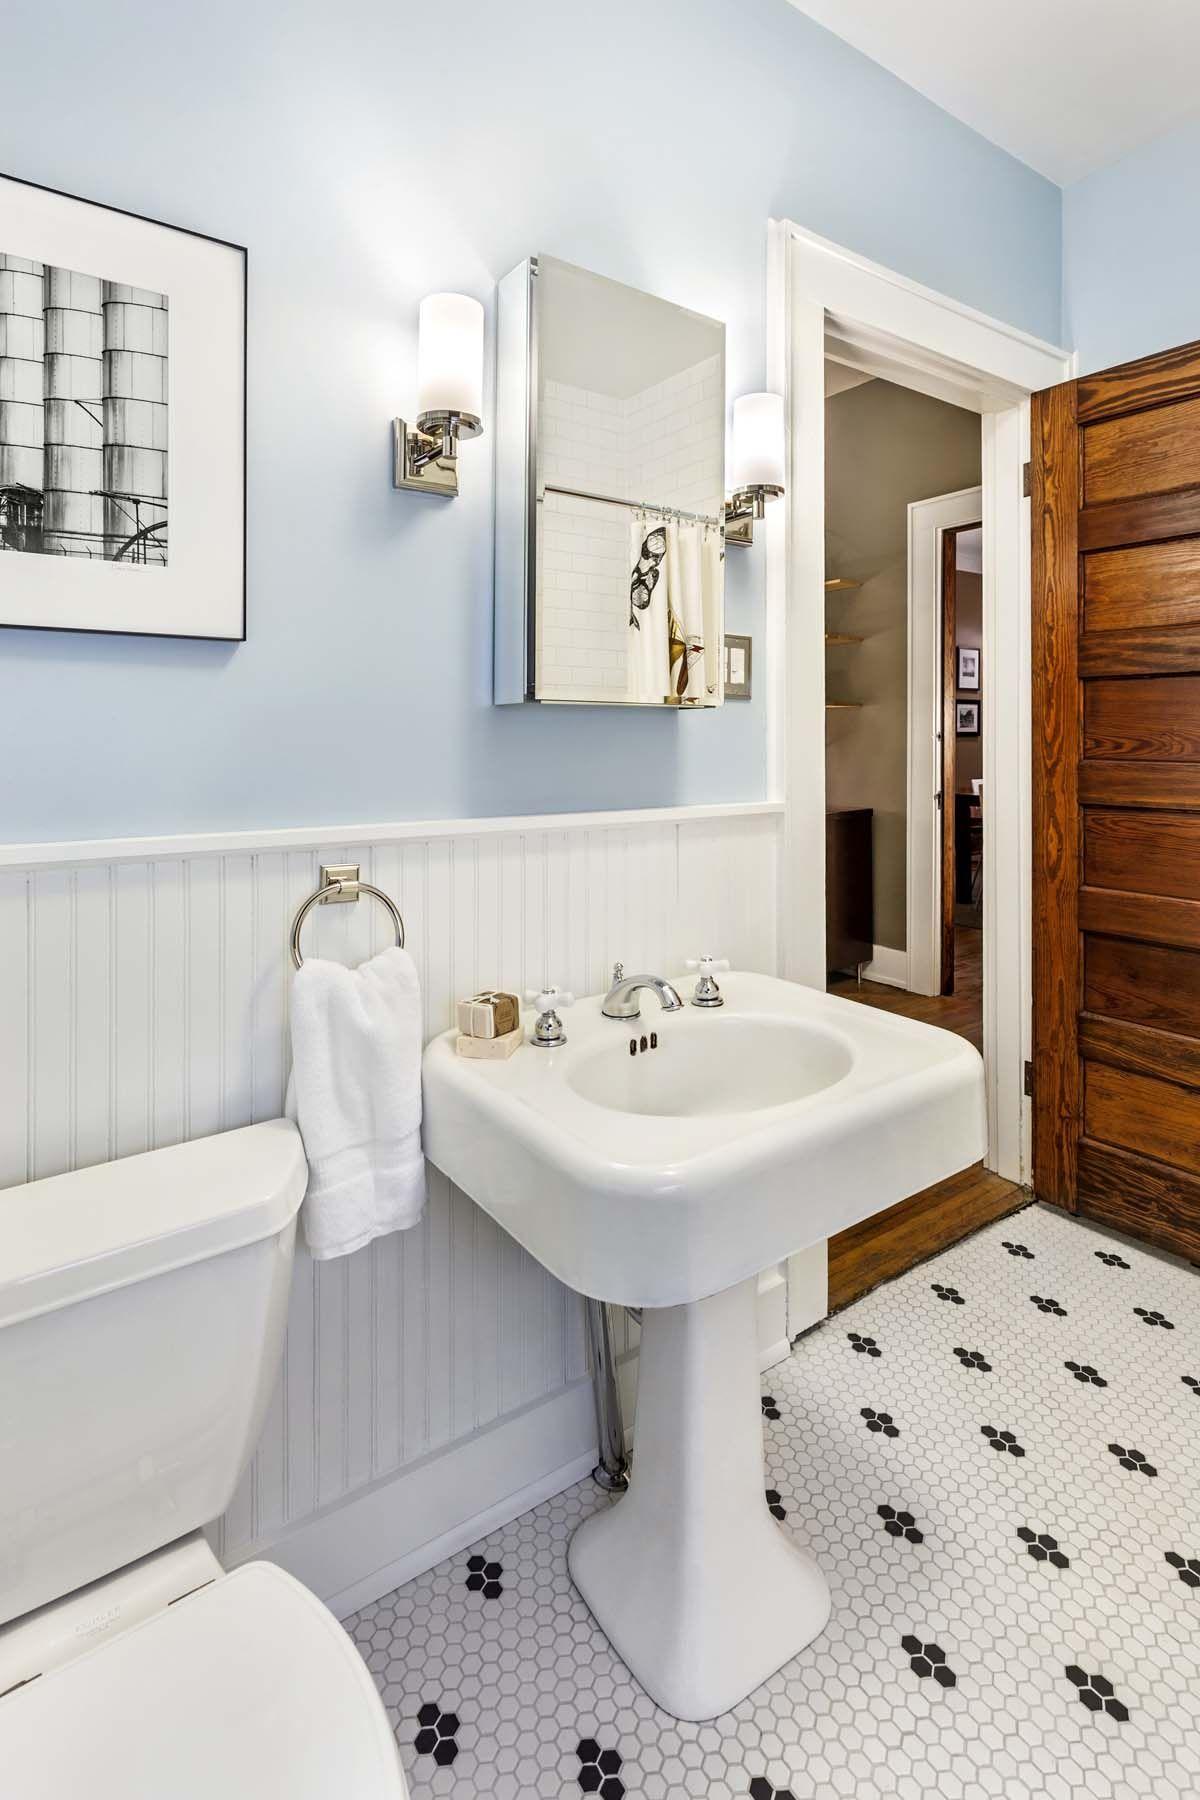 Renovated guest bathroom in 1920 Craftsman bungalow. Espresso ...